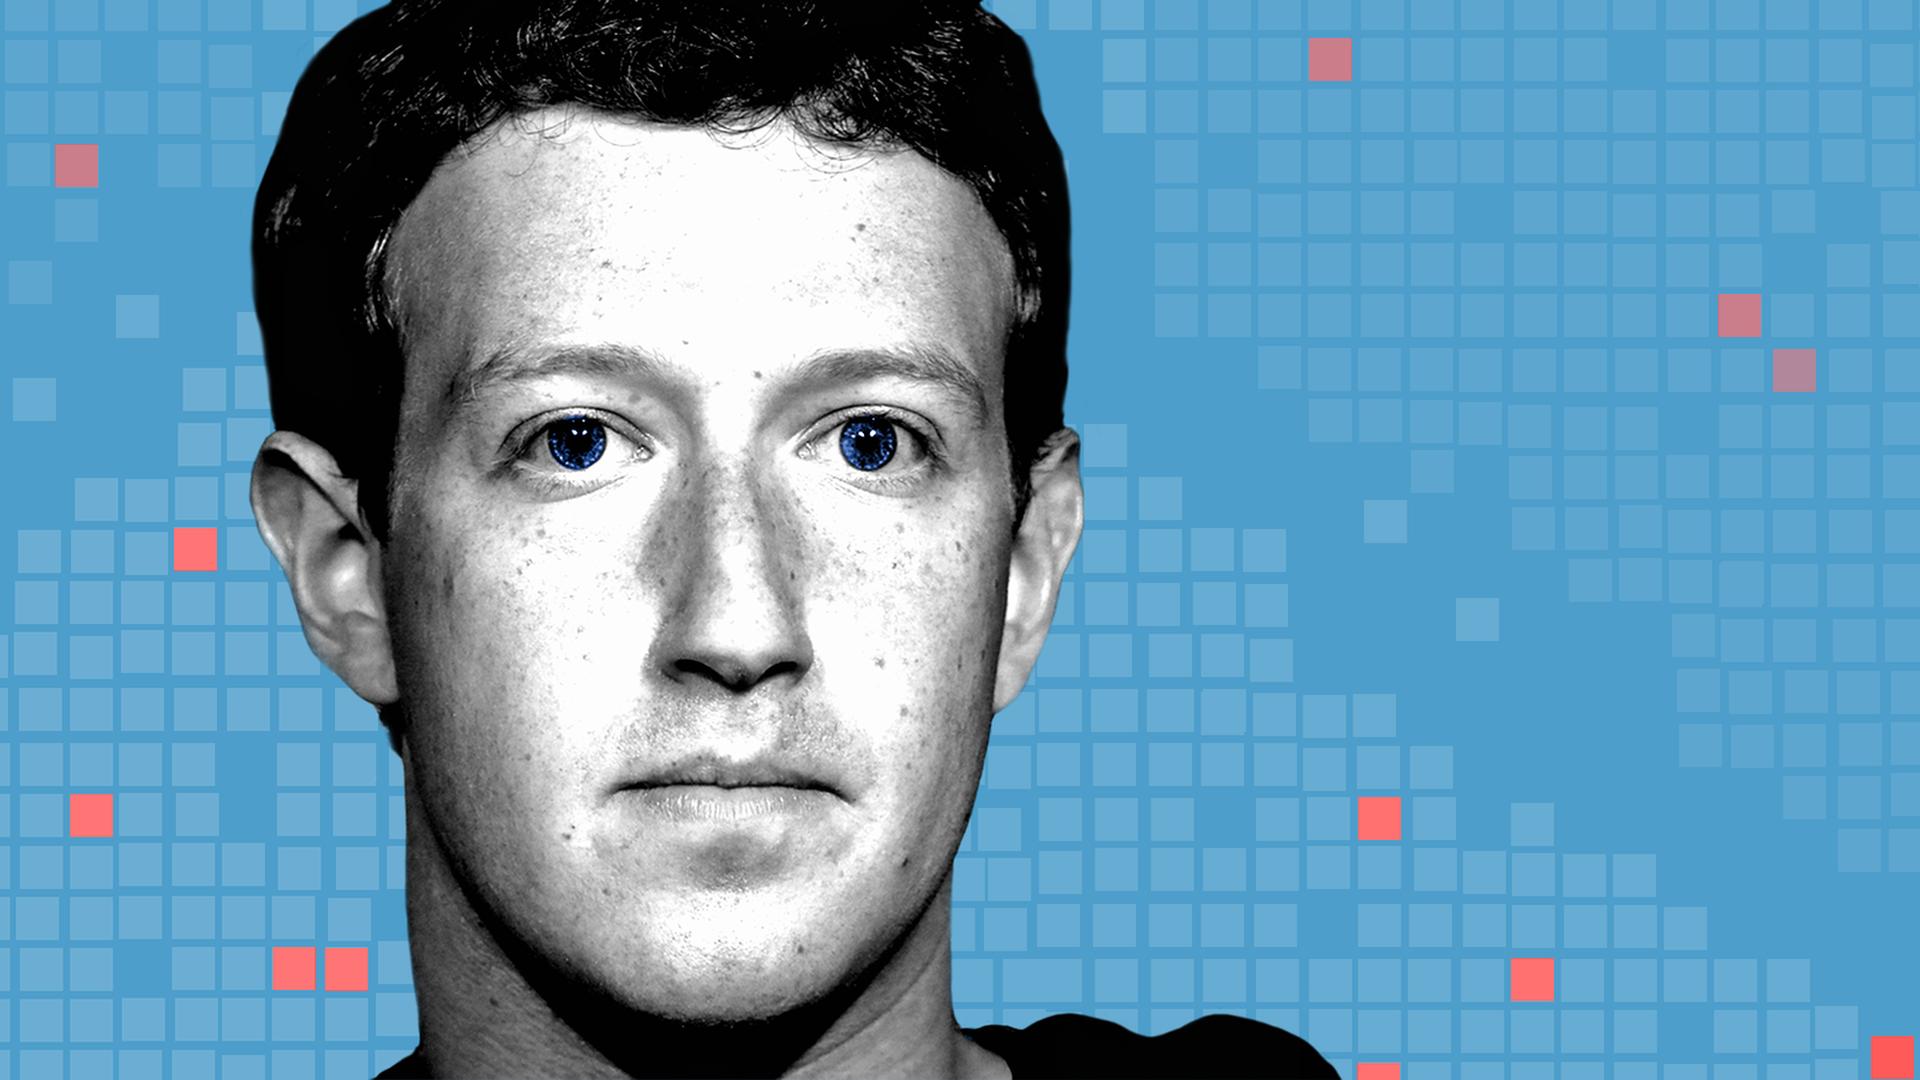 Illustration of Mark Zuckerberg's face set against a grid backdrop